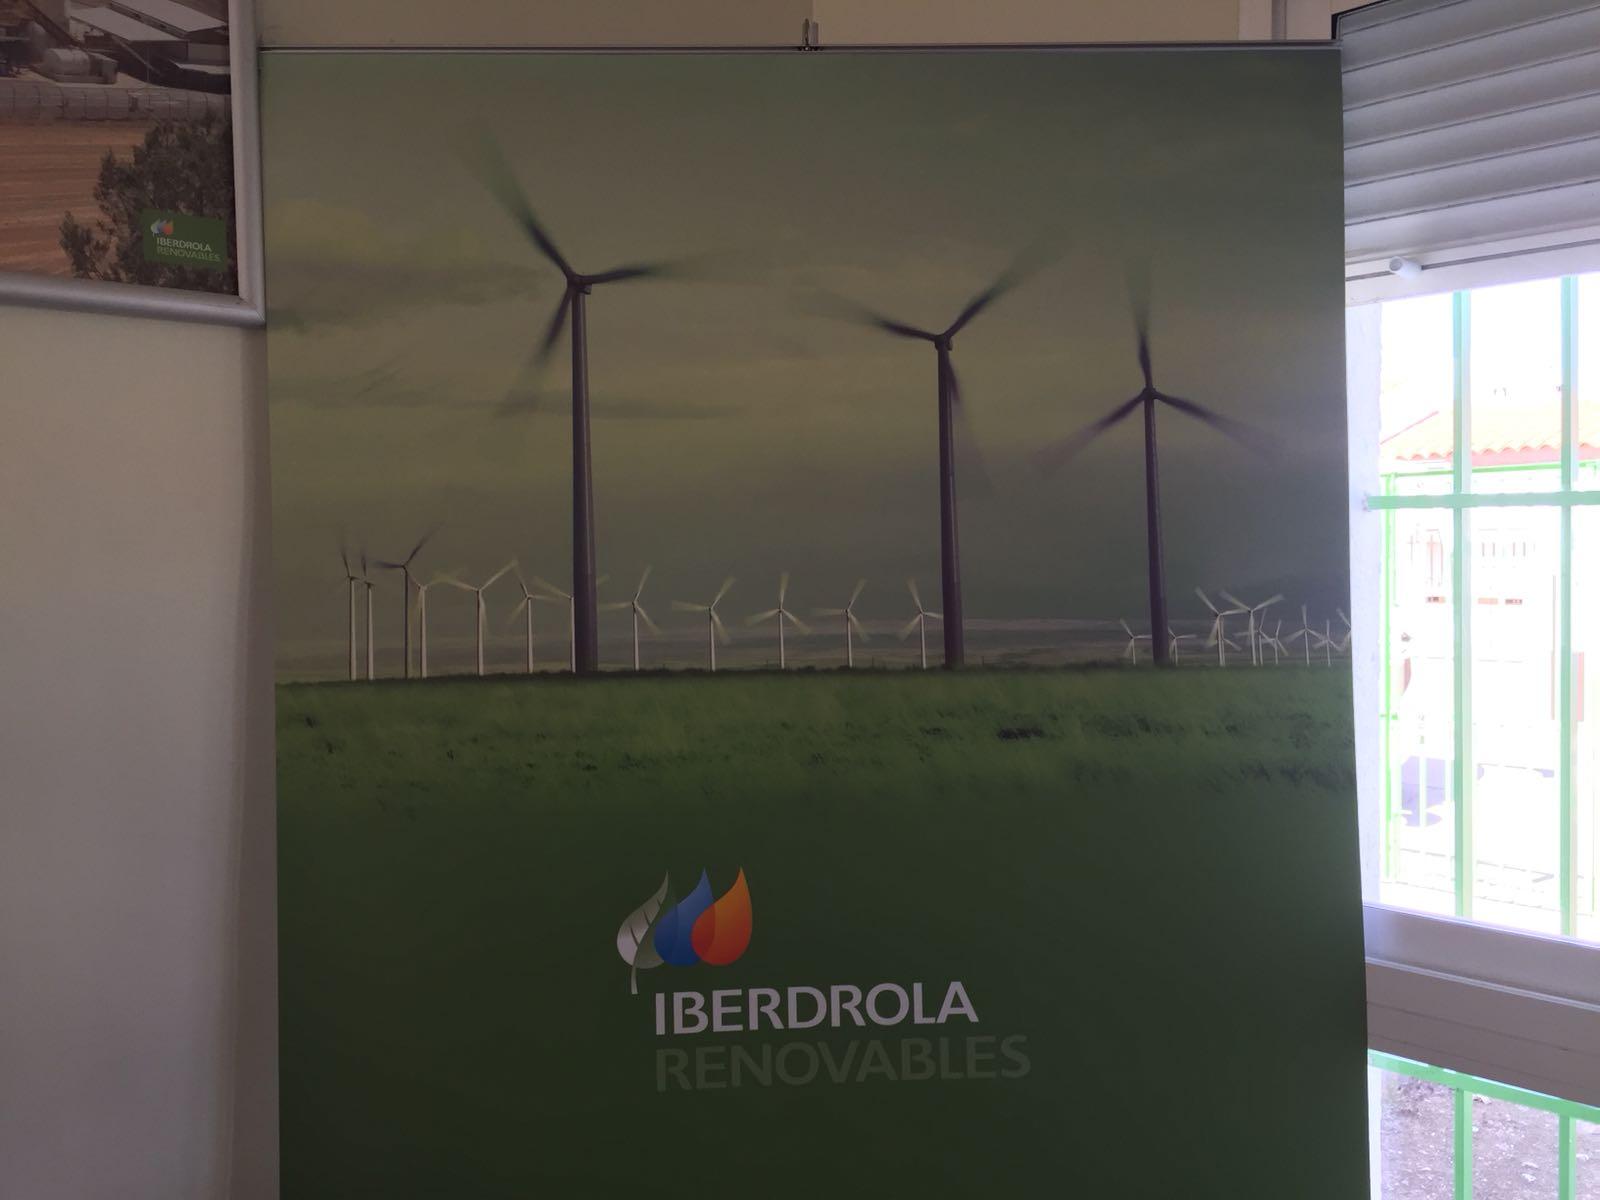 Aula Didáctica de Iberdrola Energías Renovables 49